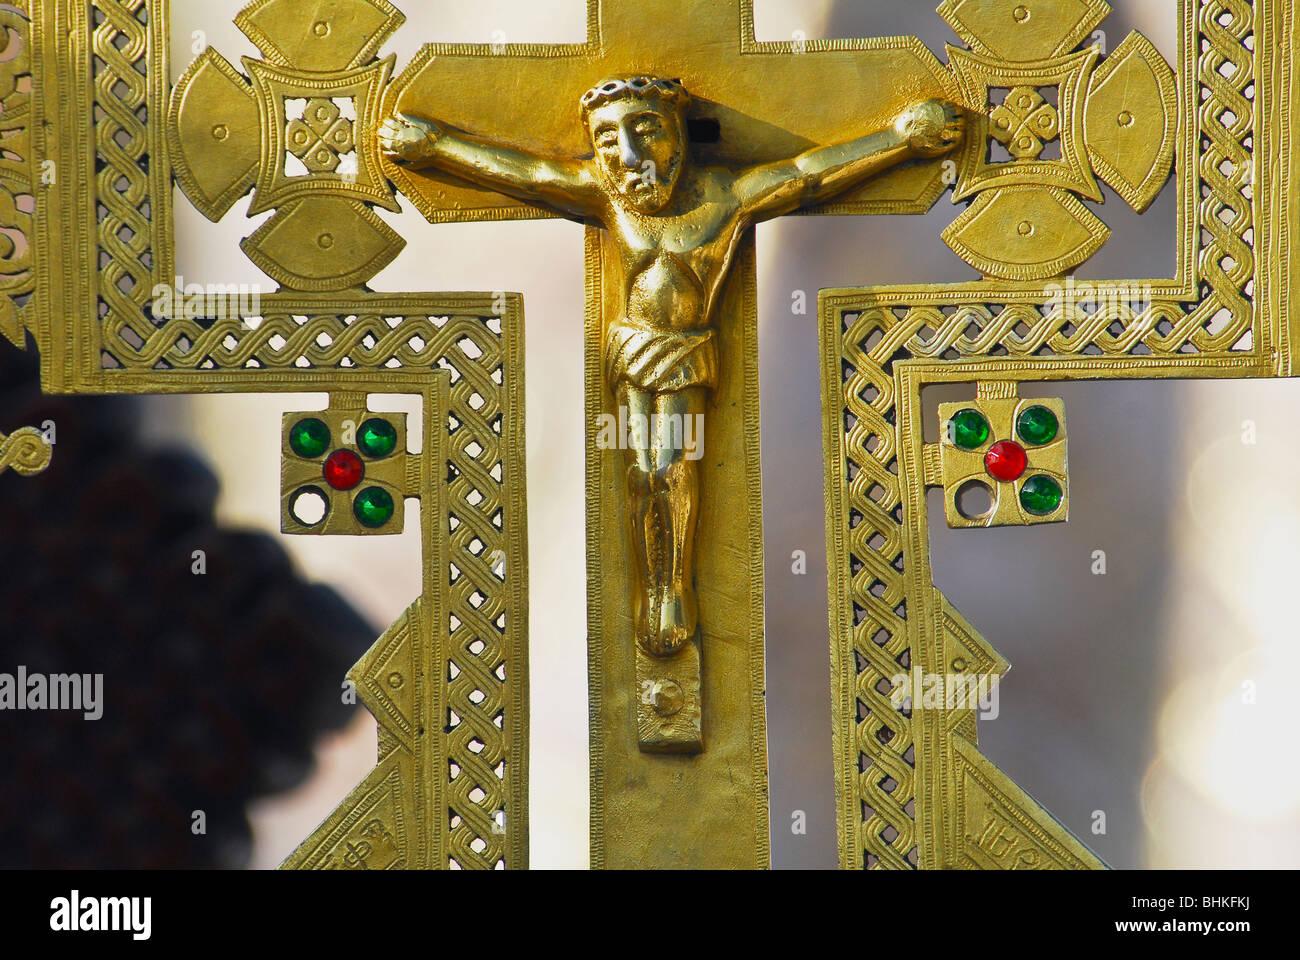 Brass crucifix on an Ethiopian ceremonial cross. - Stock Image